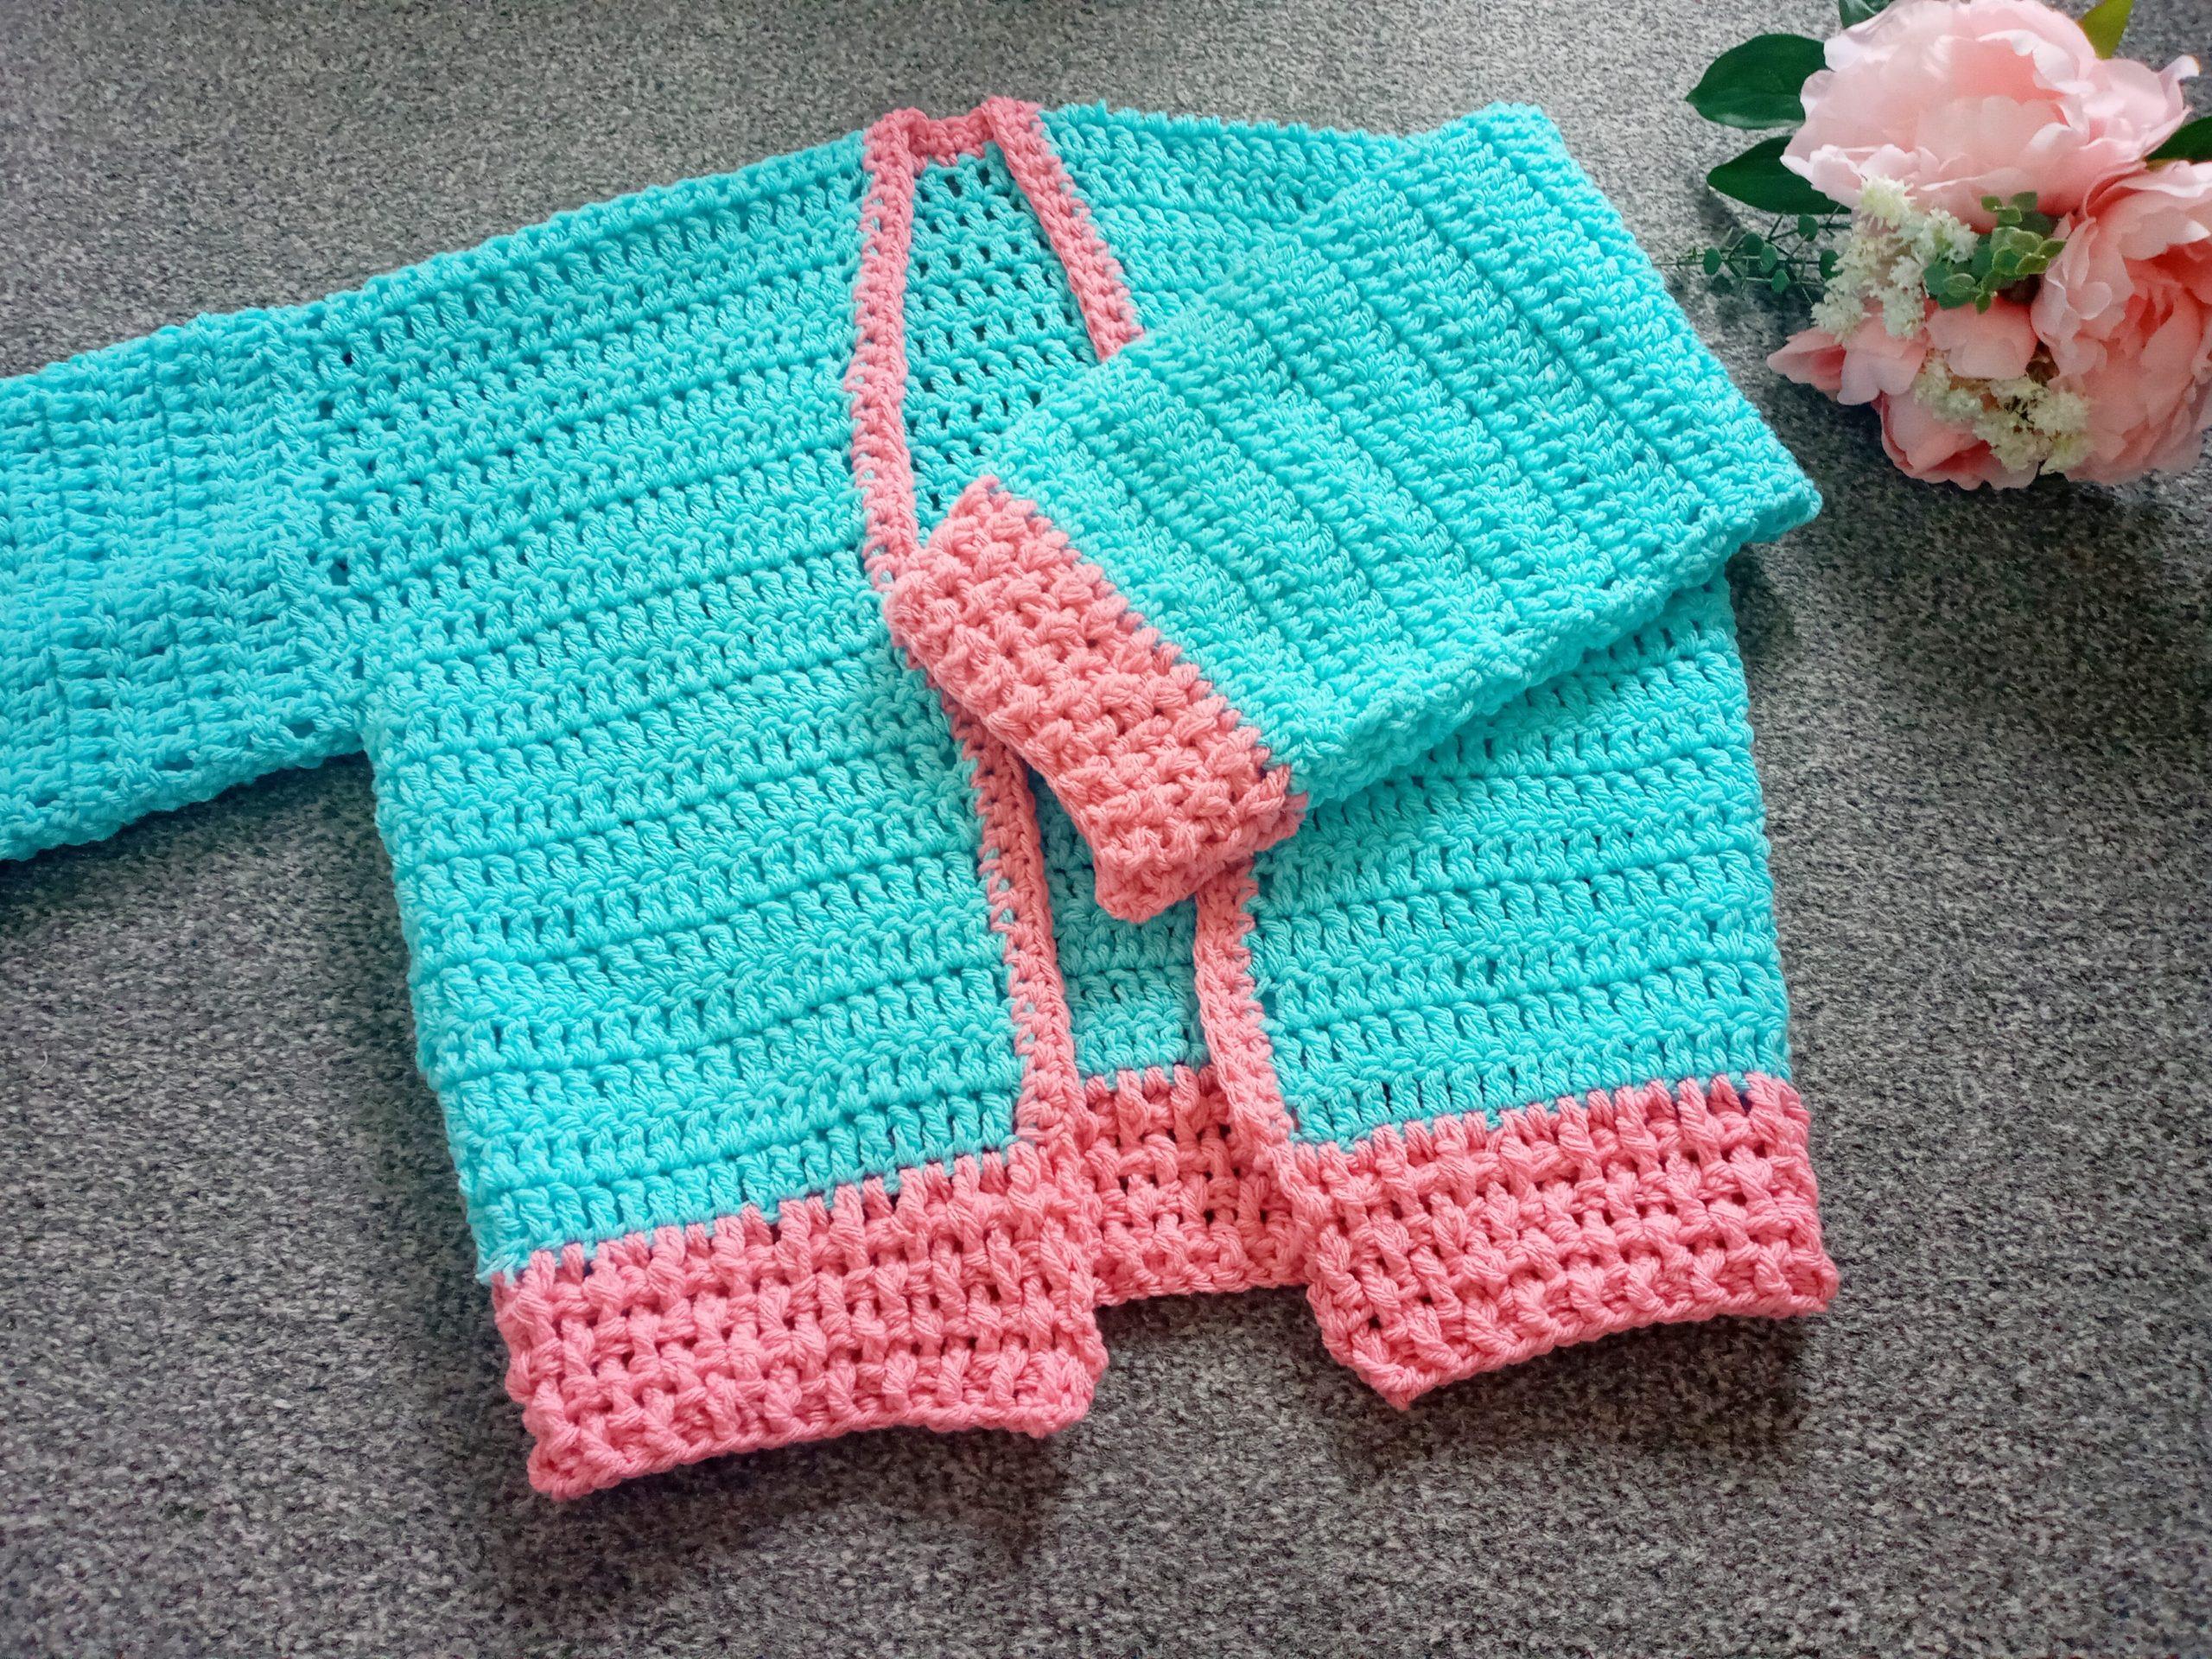 Crochet The Blue Skies Cardigan